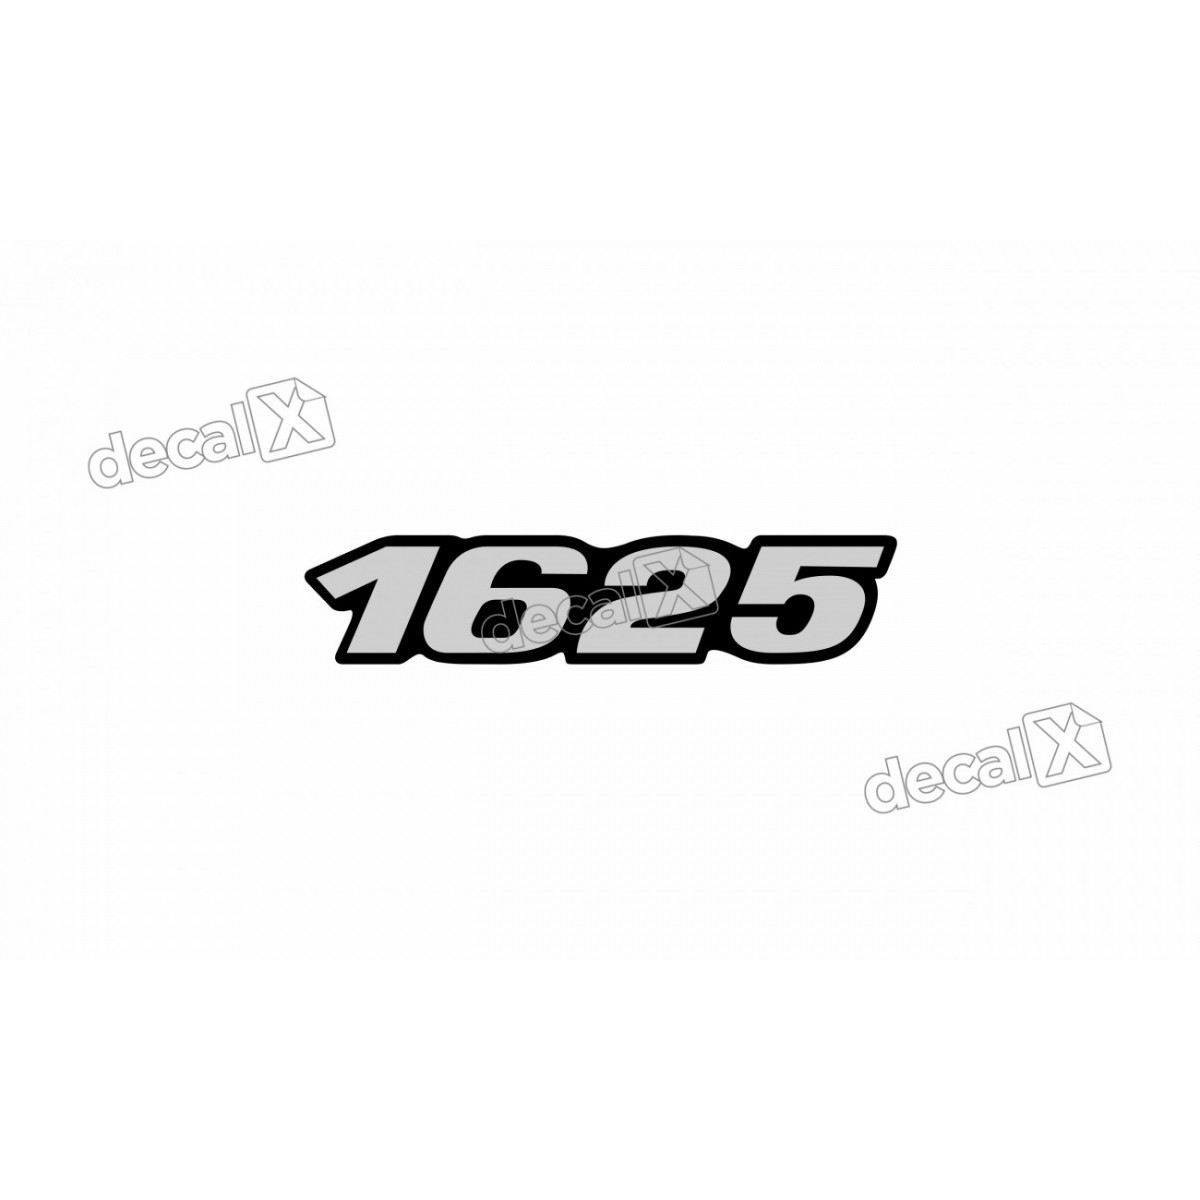 Adesivo Emblema Resinado Mercedes 1625 Cm52 Decalx